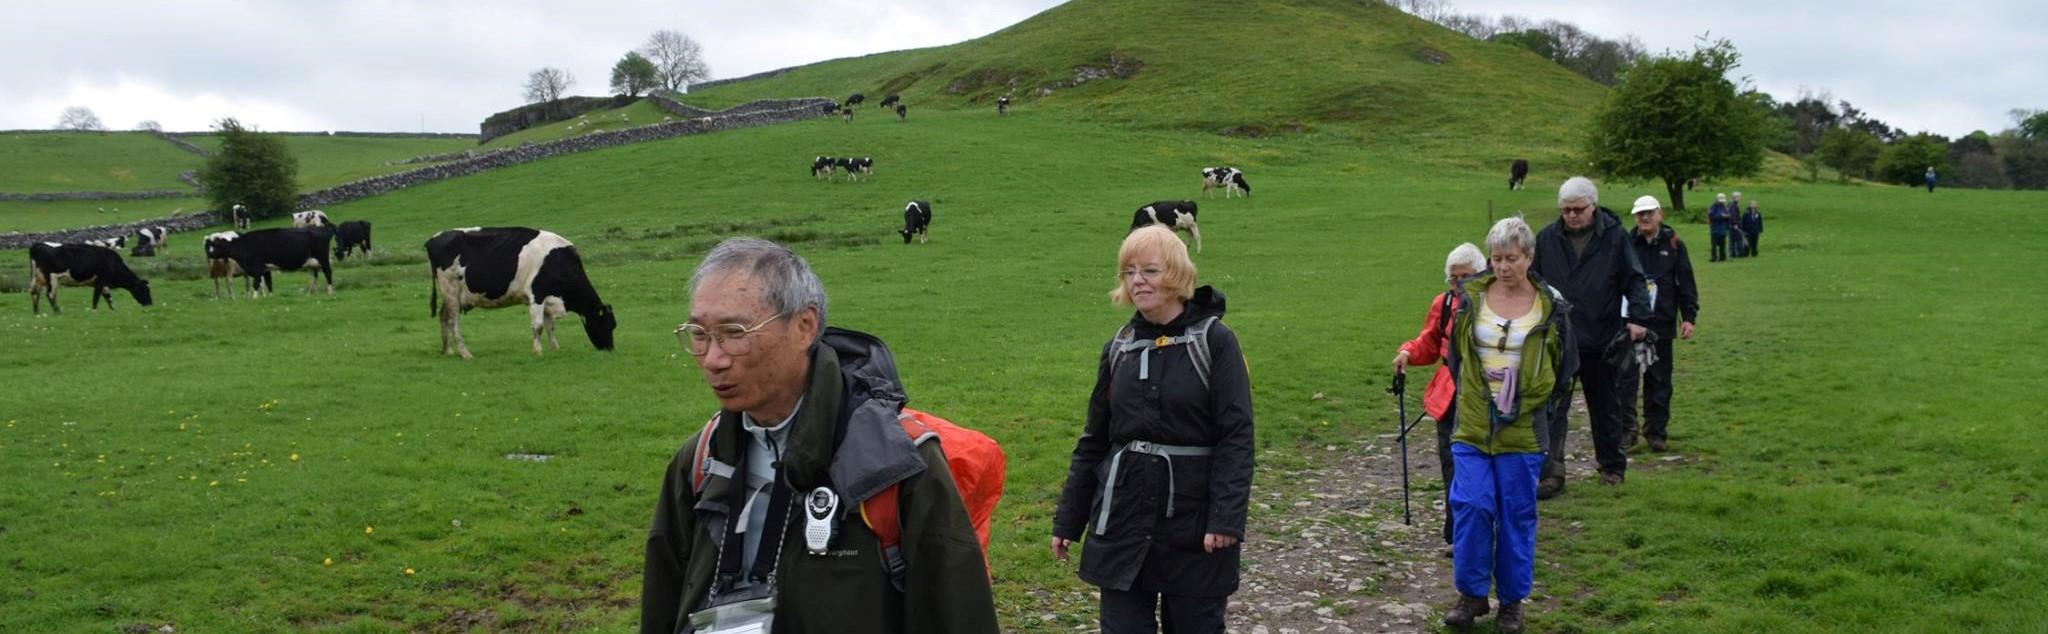 Walkig Group Peak Pilgrimage